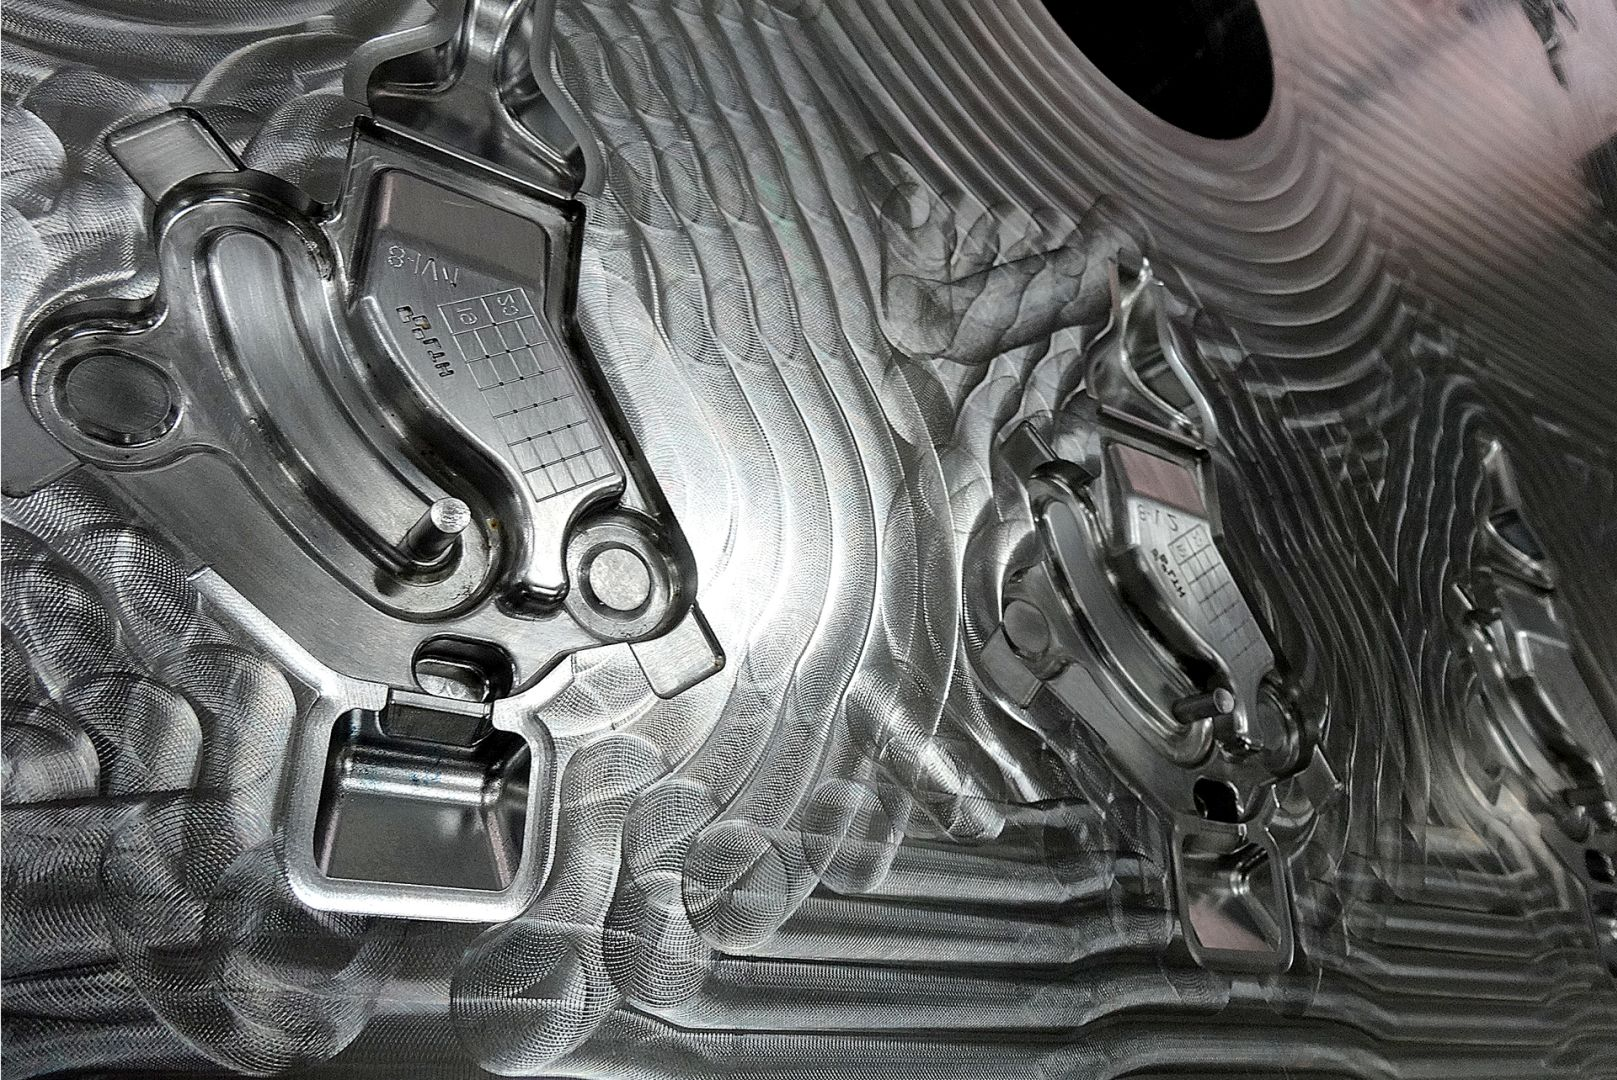 Toolshop–Werkzeugbau–orodjarstvo-7 Orodja za tlacno litje _ slika 5a